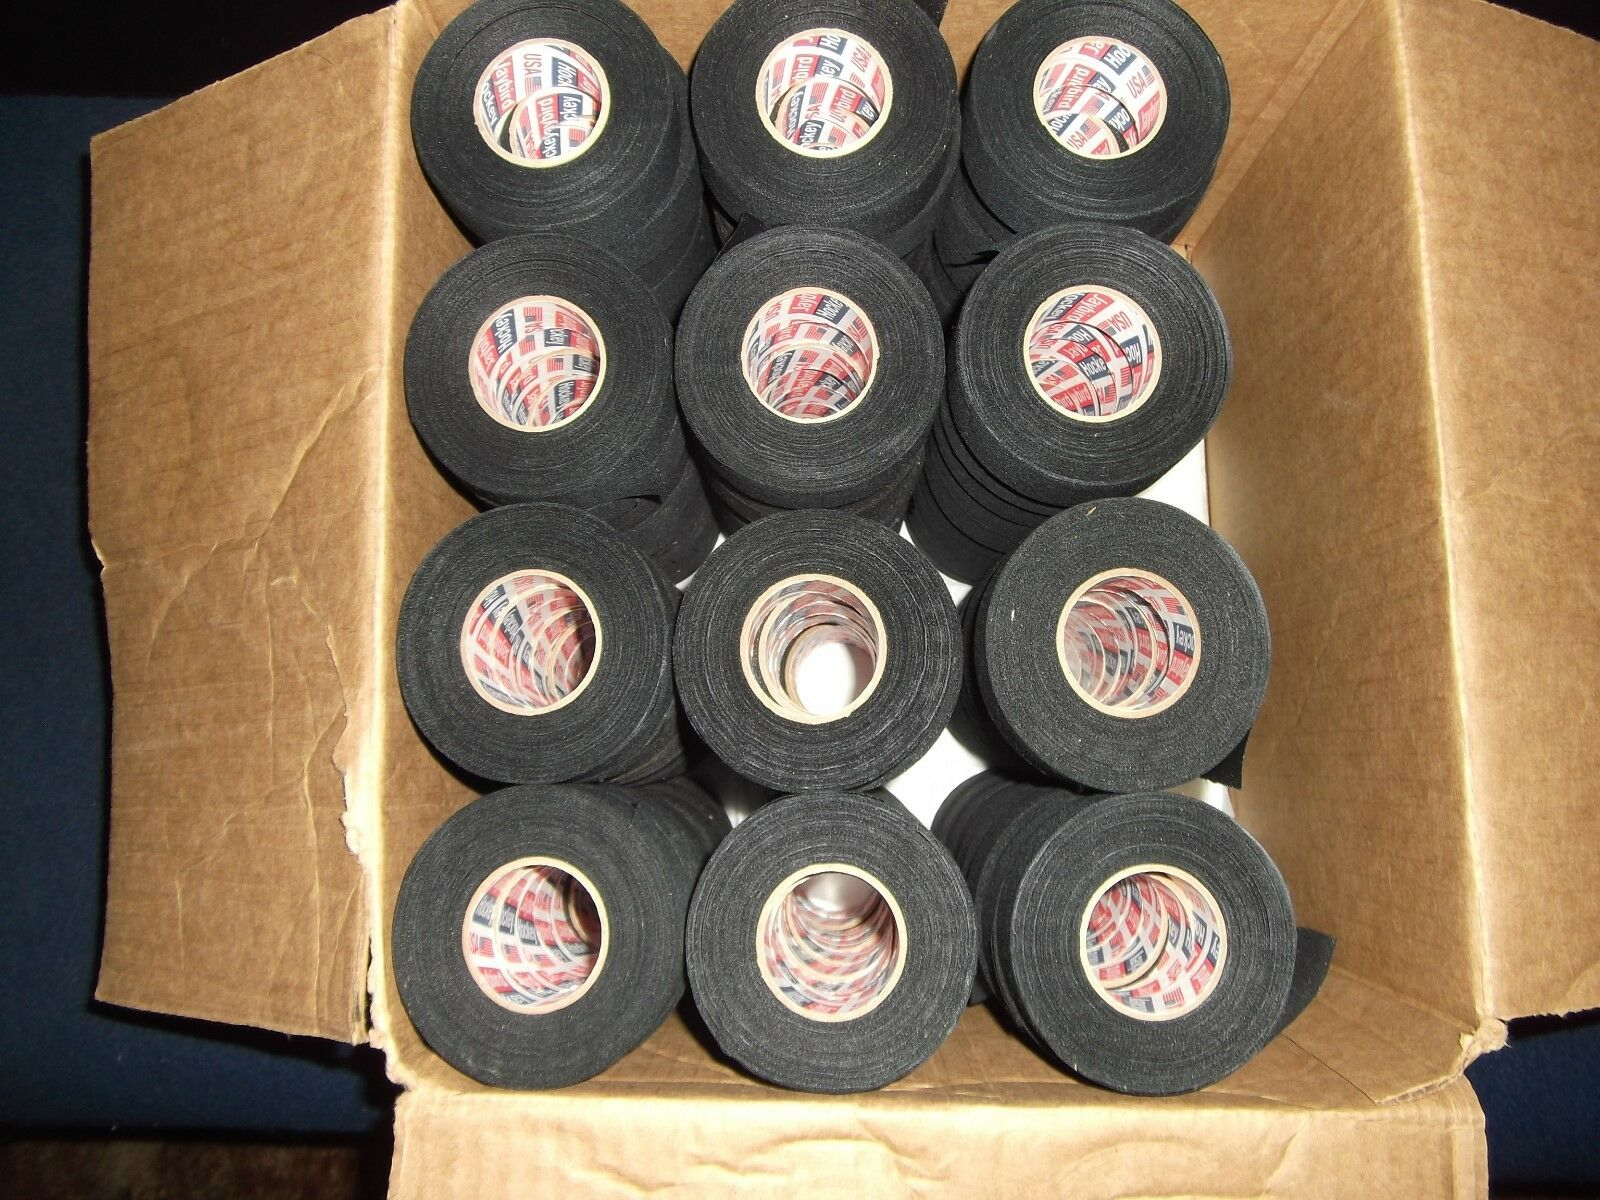 81 rollos de cinta de Béisbol Negra 1 x25yds.  primera Calidad